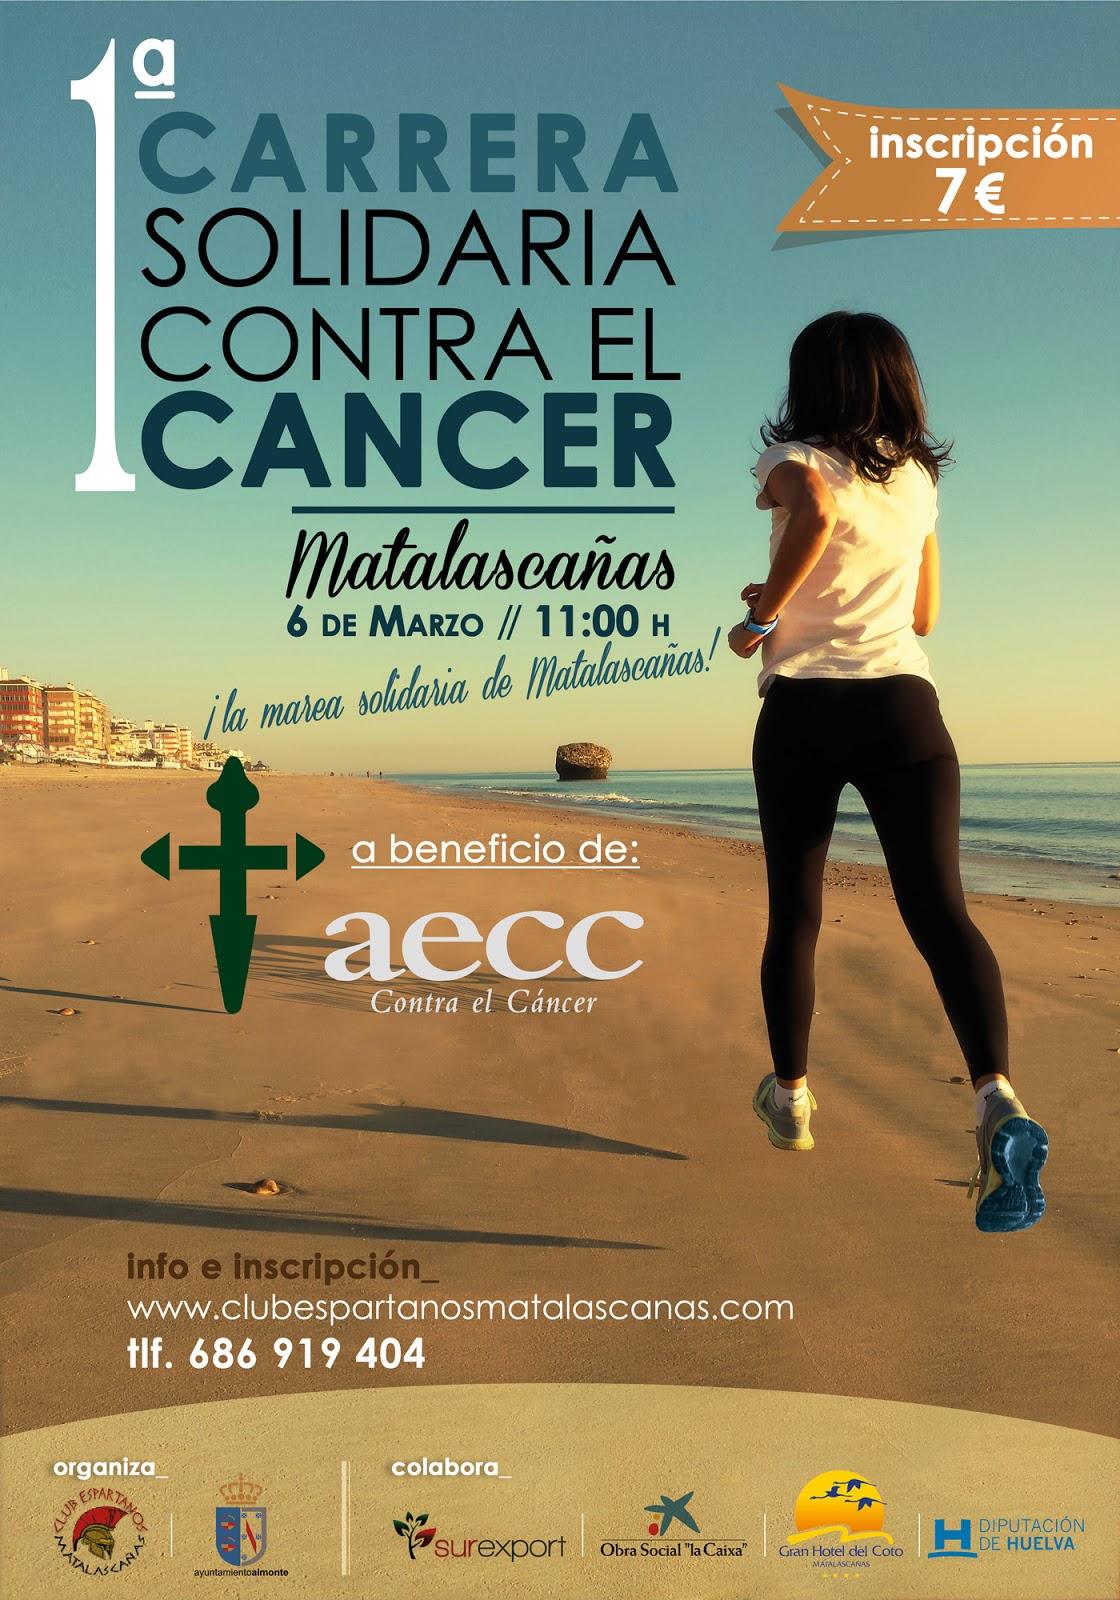 I Carrera / Caminata Solidaria Contra el Cáncer Playa de Doñana - Matalascañas